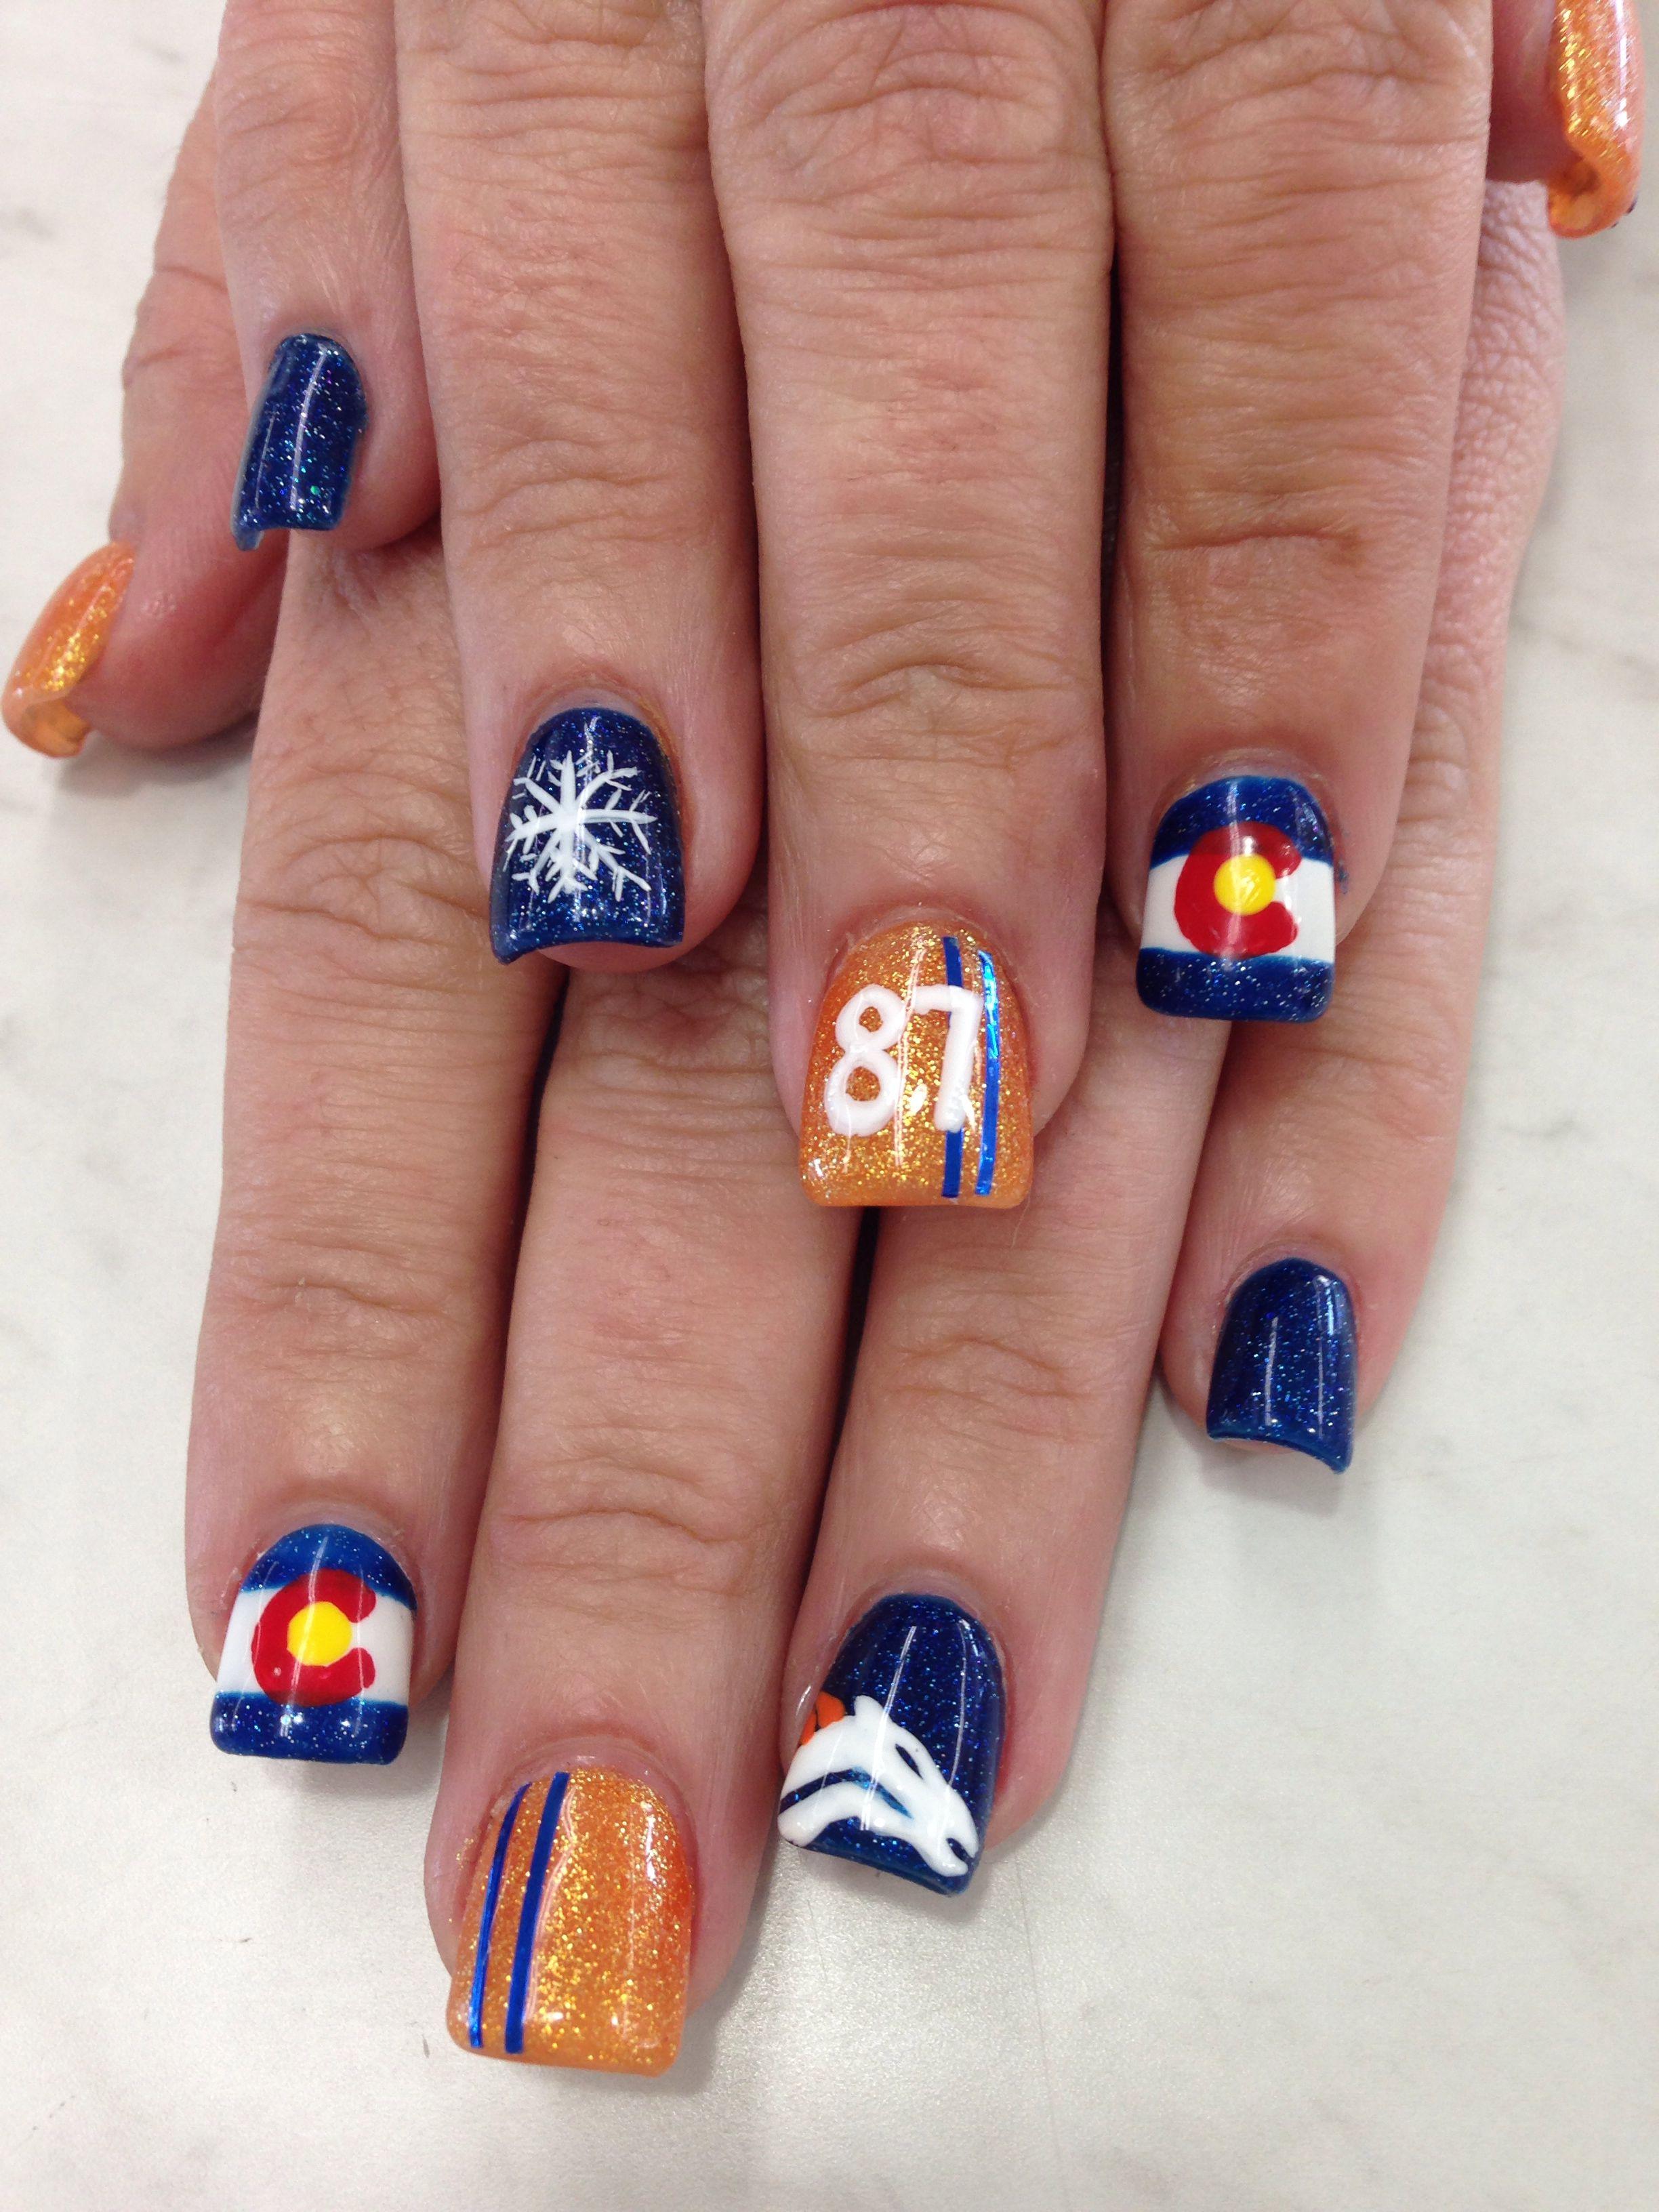 Nail art. Denver Broncos | My nail art | Pinterest | Denver, Broncos ...